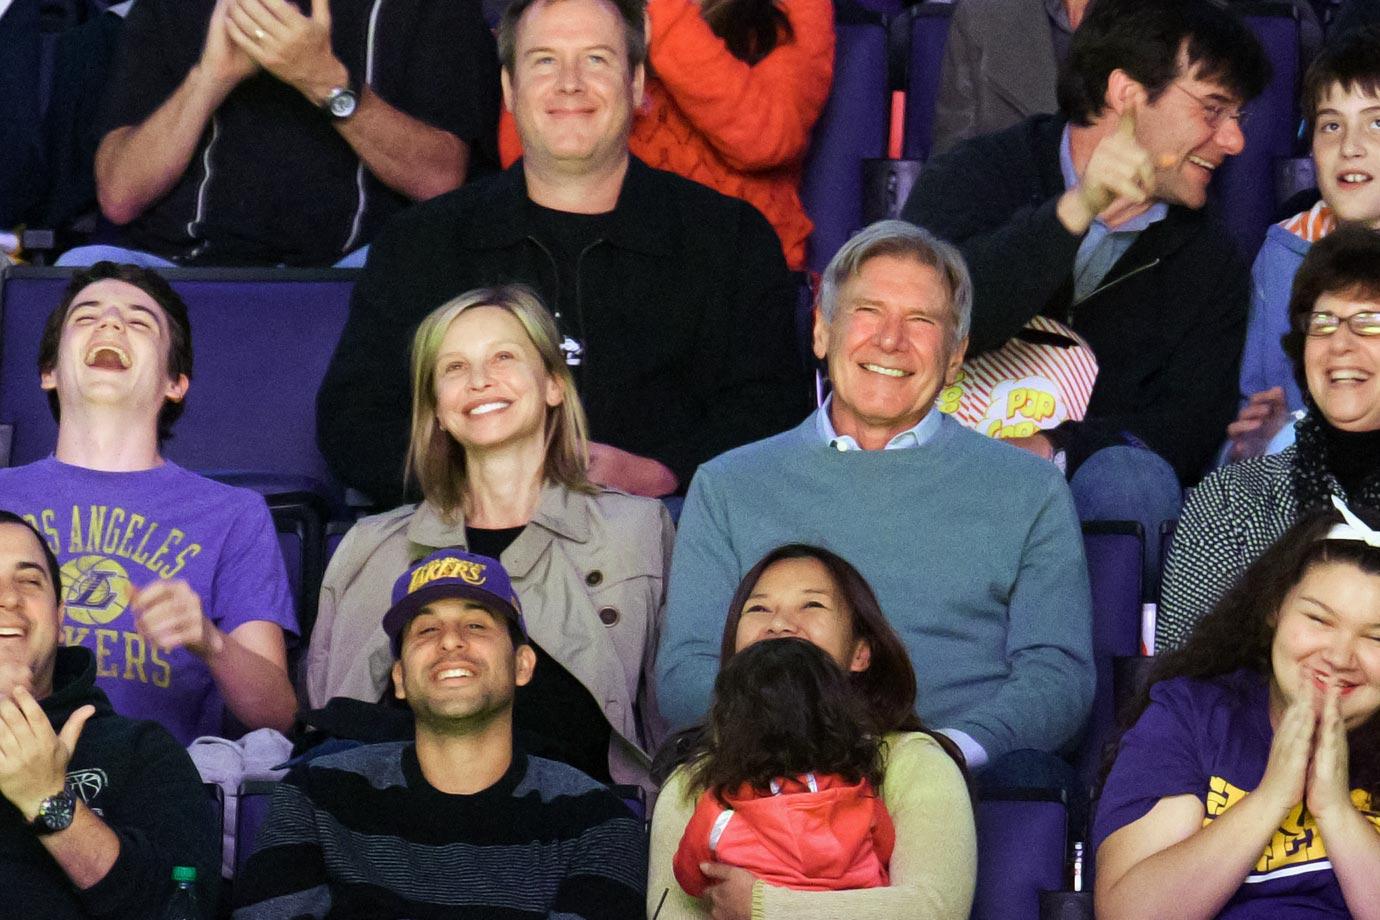 Feb. 22, 2015: Los Angeles Lakers vs. Boston Celtics at Staples Center in Los Angeles